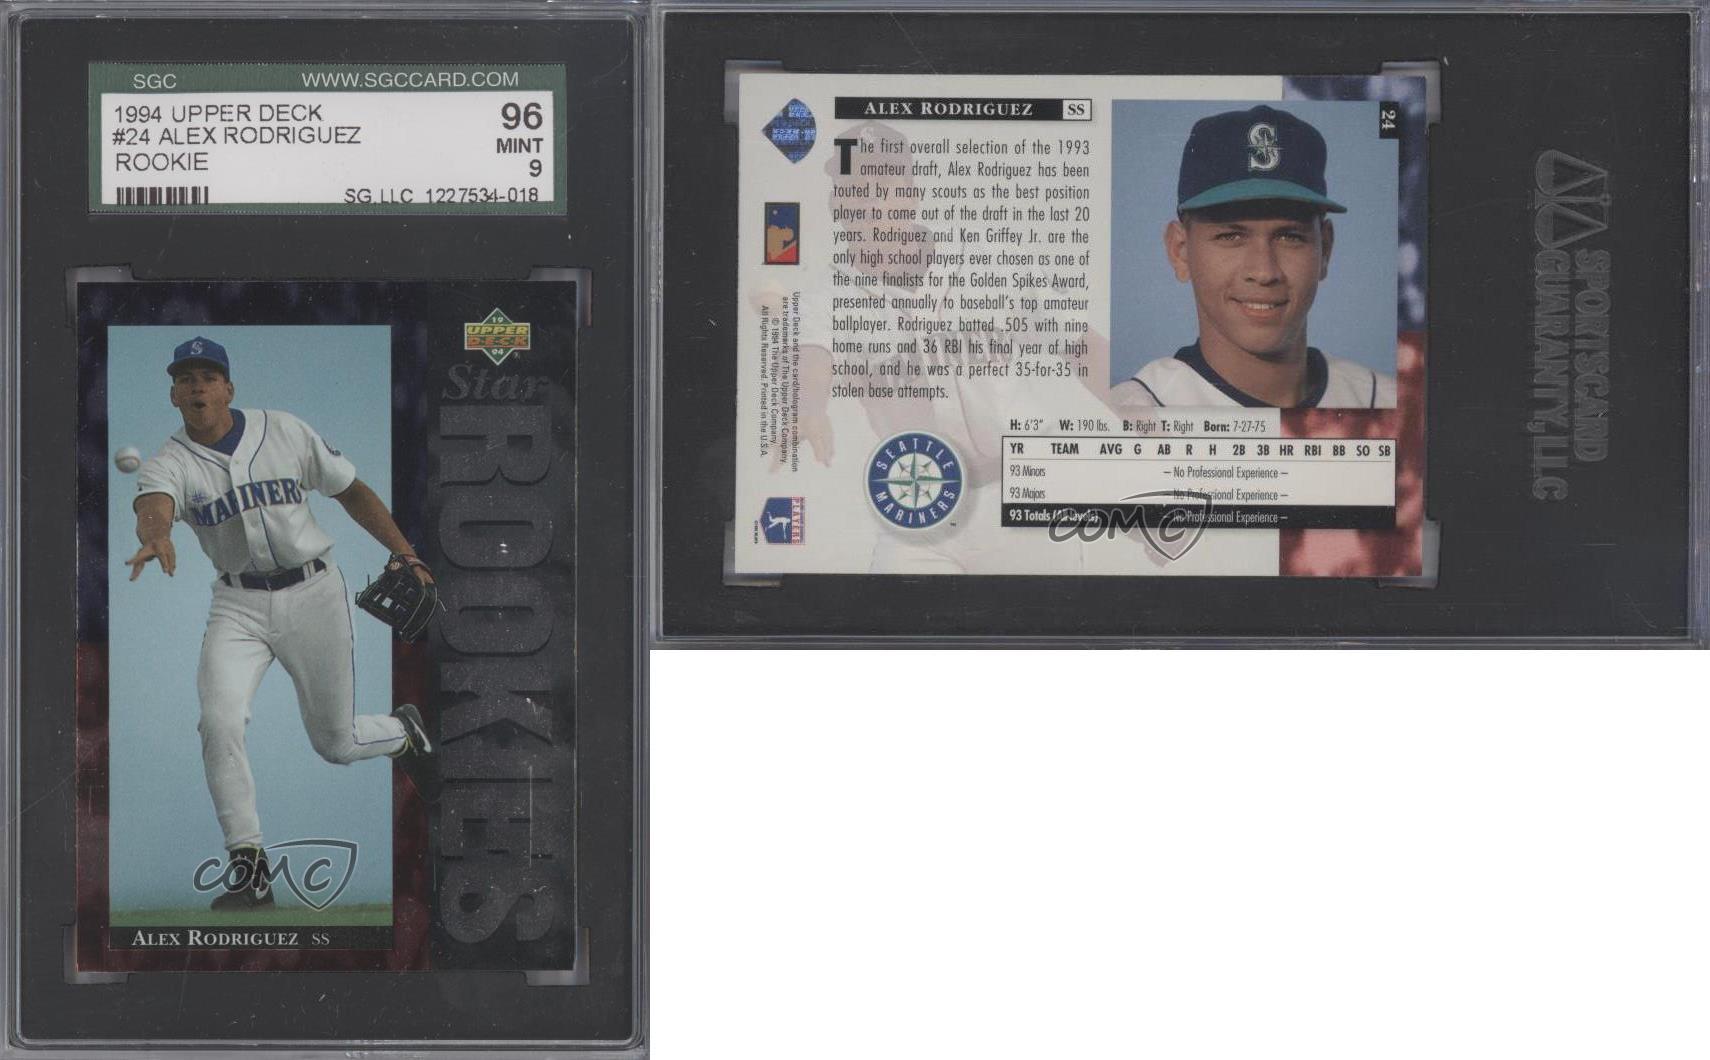 Honkbal 1994 Upper Deck #24 Alex Rodriguez PSA 9 MINT Seattle Mariners RC Baseball Card Verzamelingen